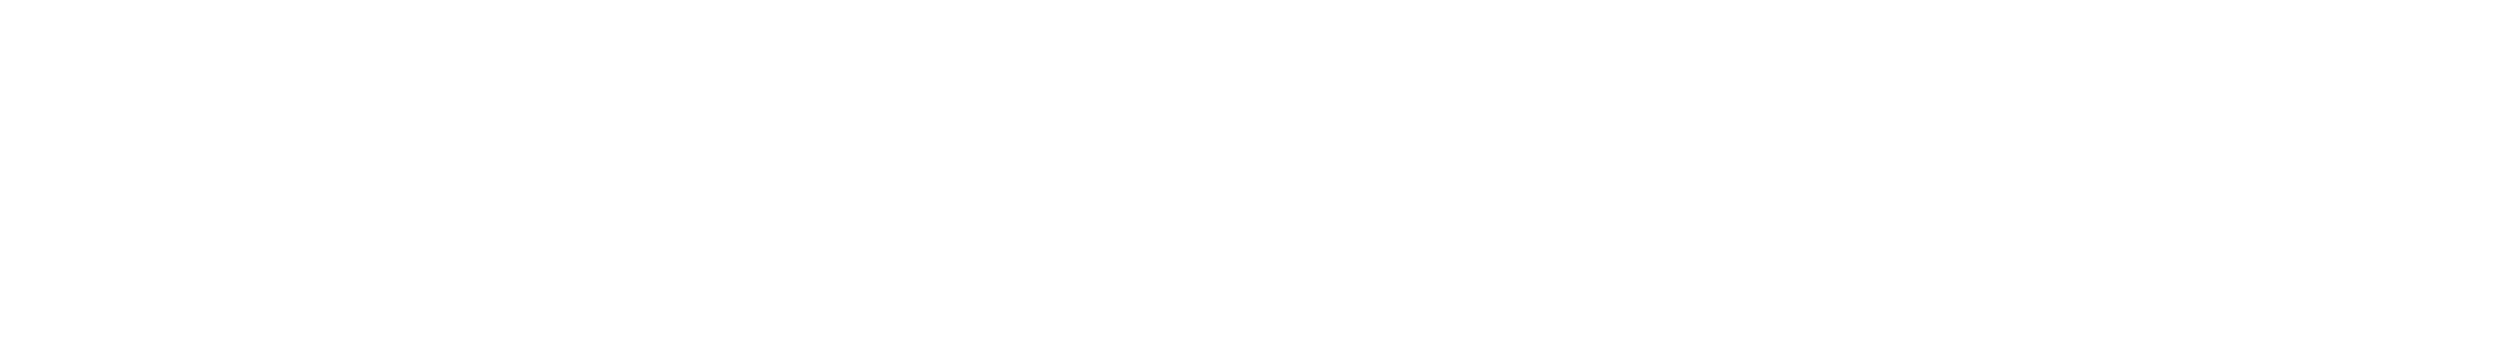 top image wrap